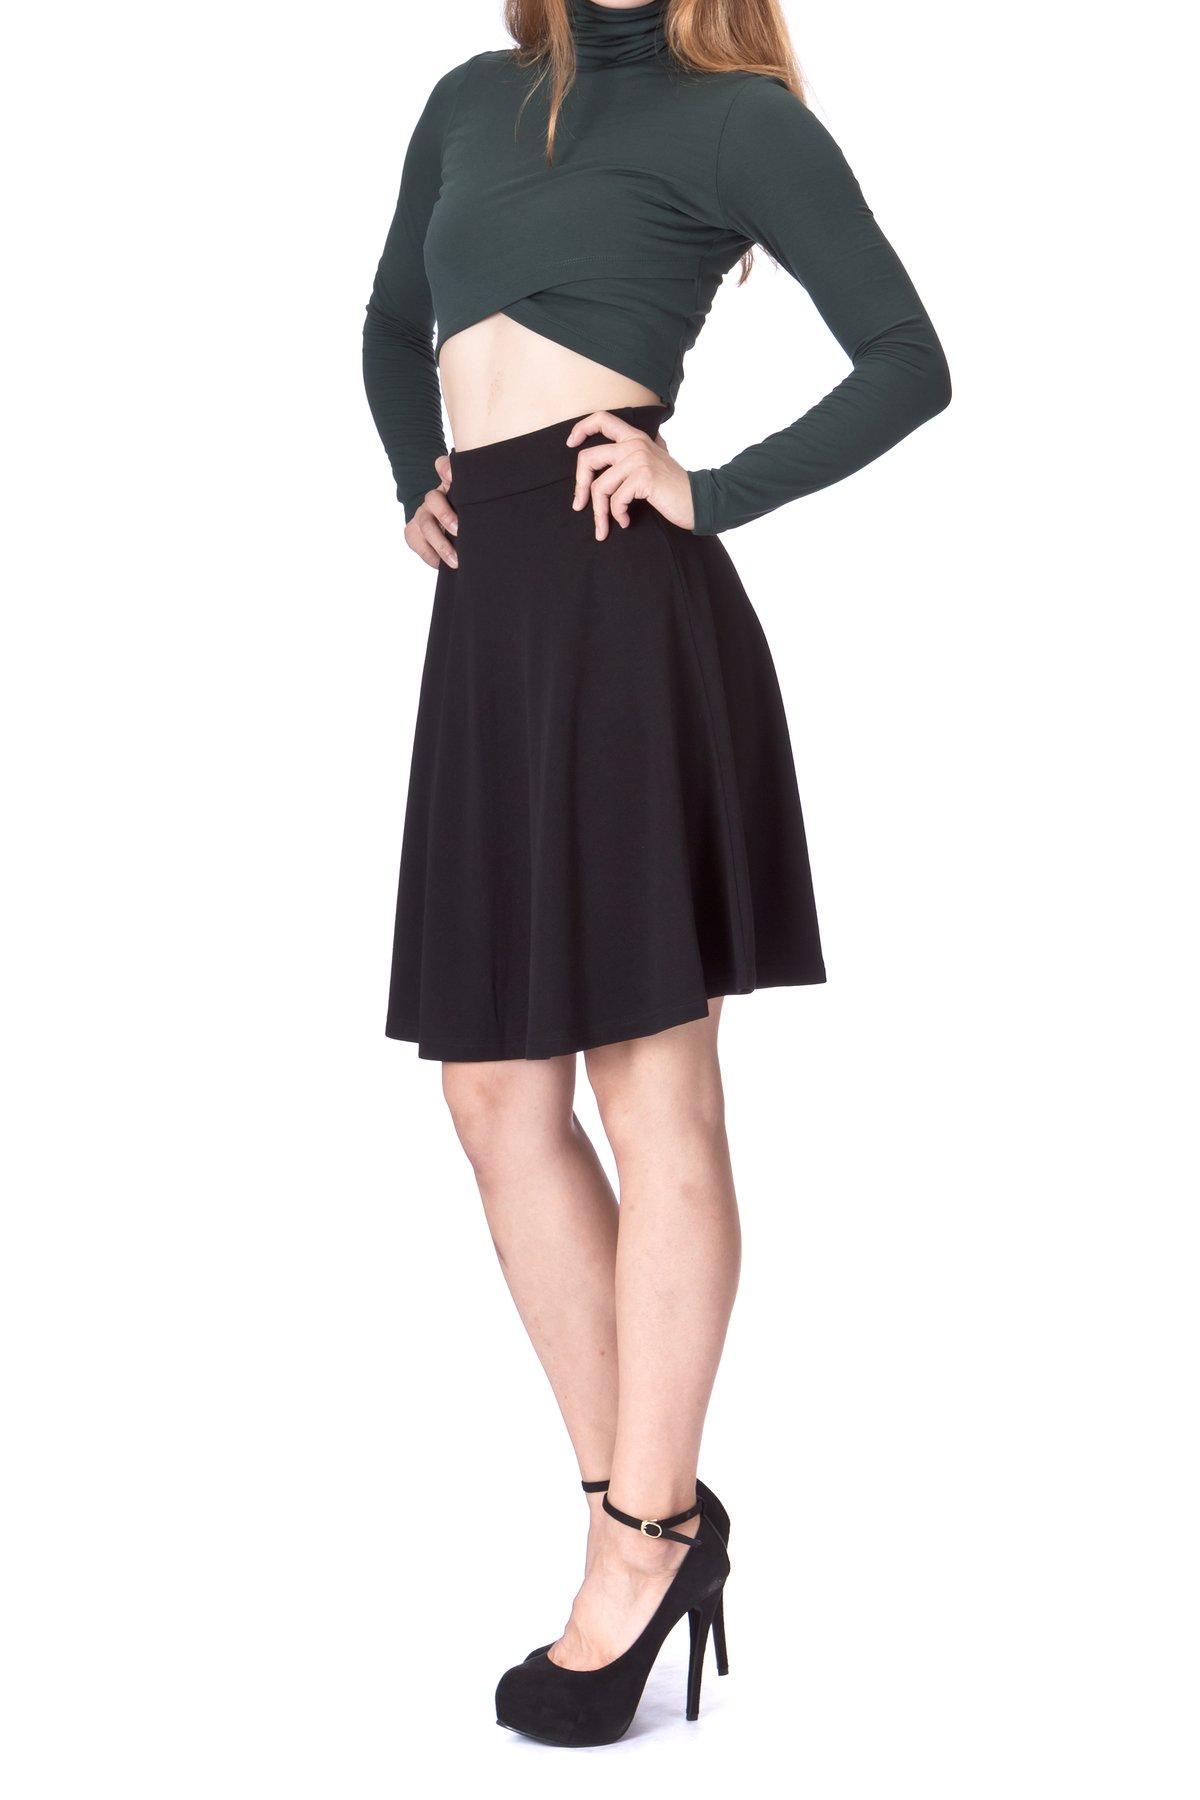 Simple Stretch A-line Flared Knee Length Skirt (S, Knee Black)